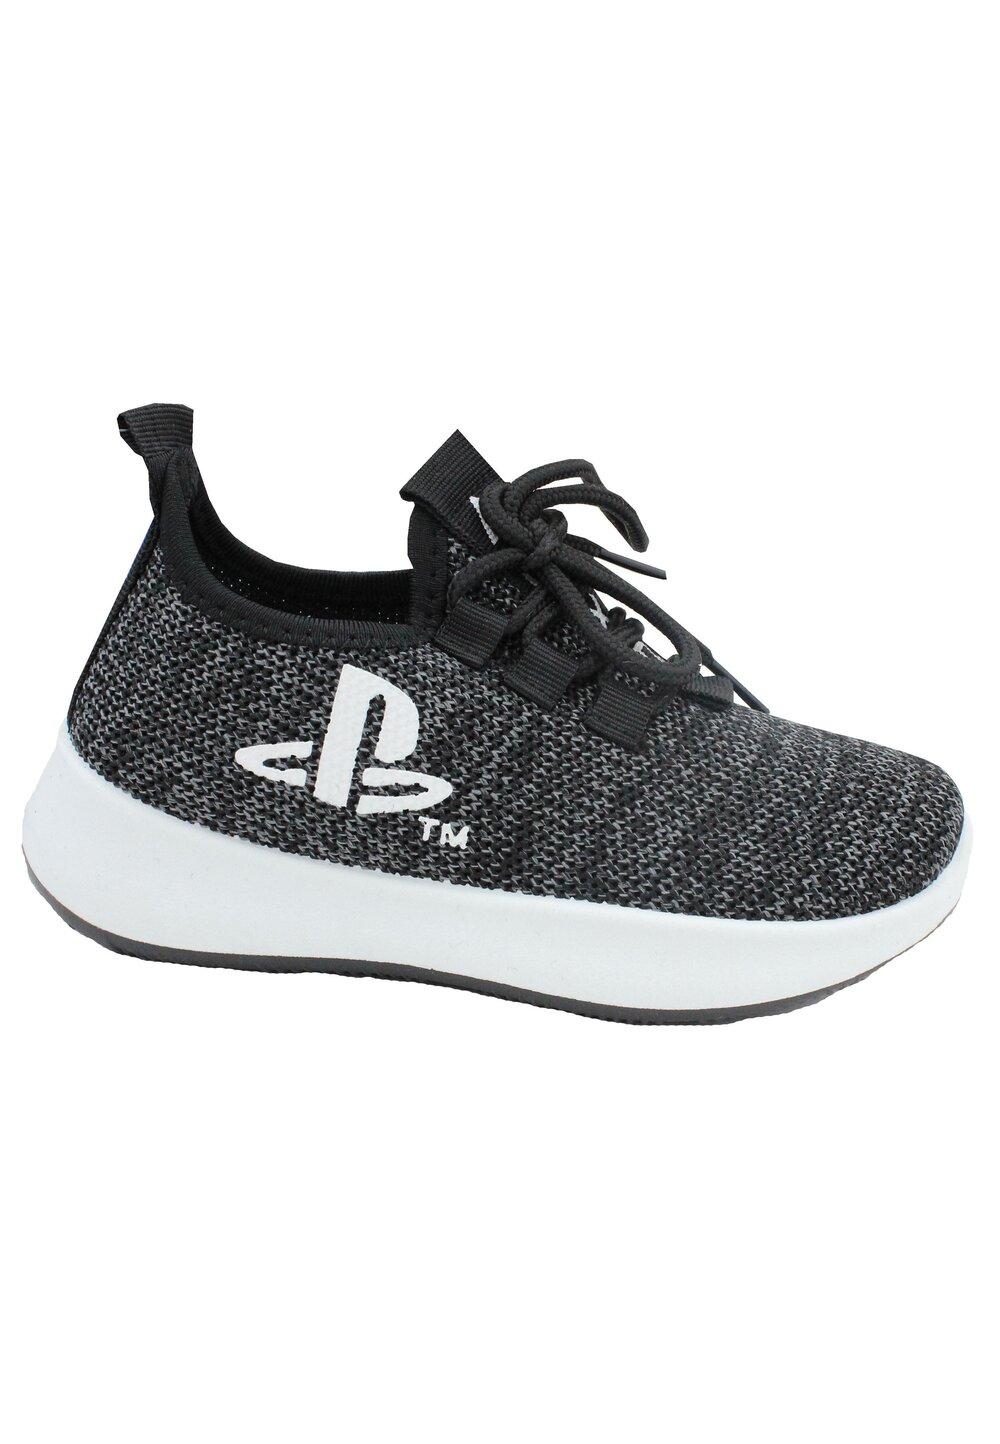 Incaltaminte sport, din material textil, cu siret, PlayStation, gri inchis